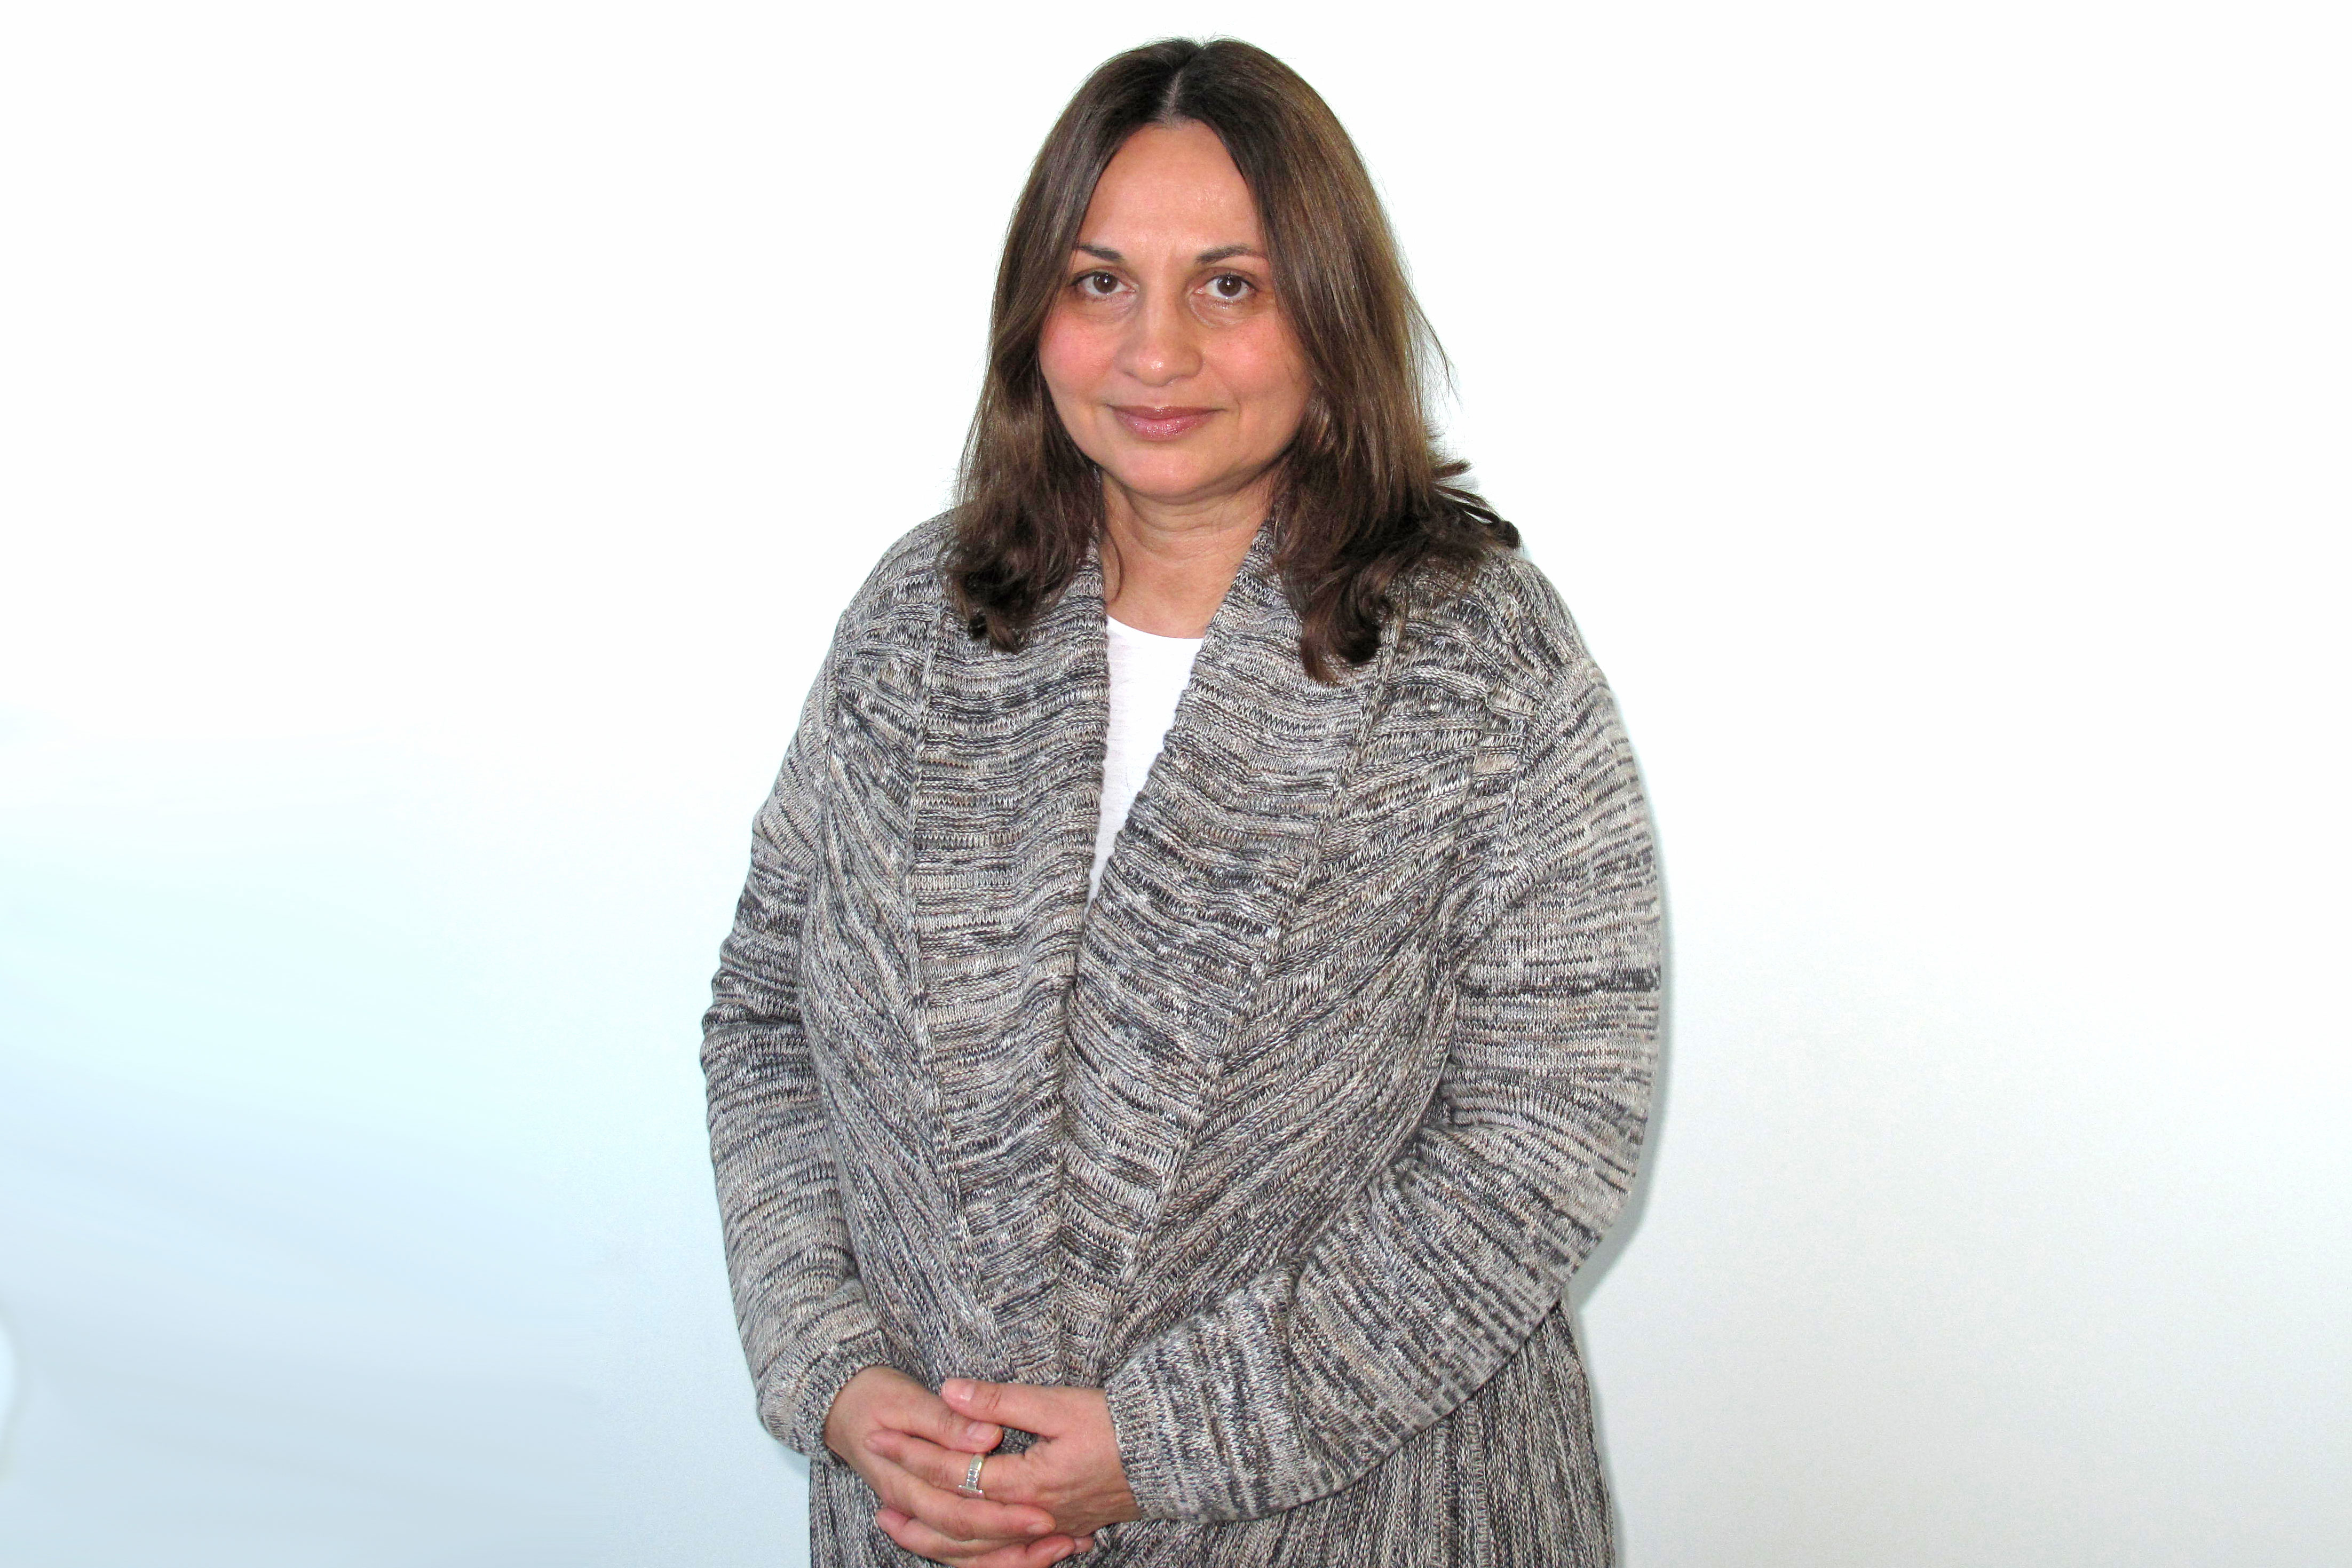 Soraya Sarhaddi Nelson in WFIU studios